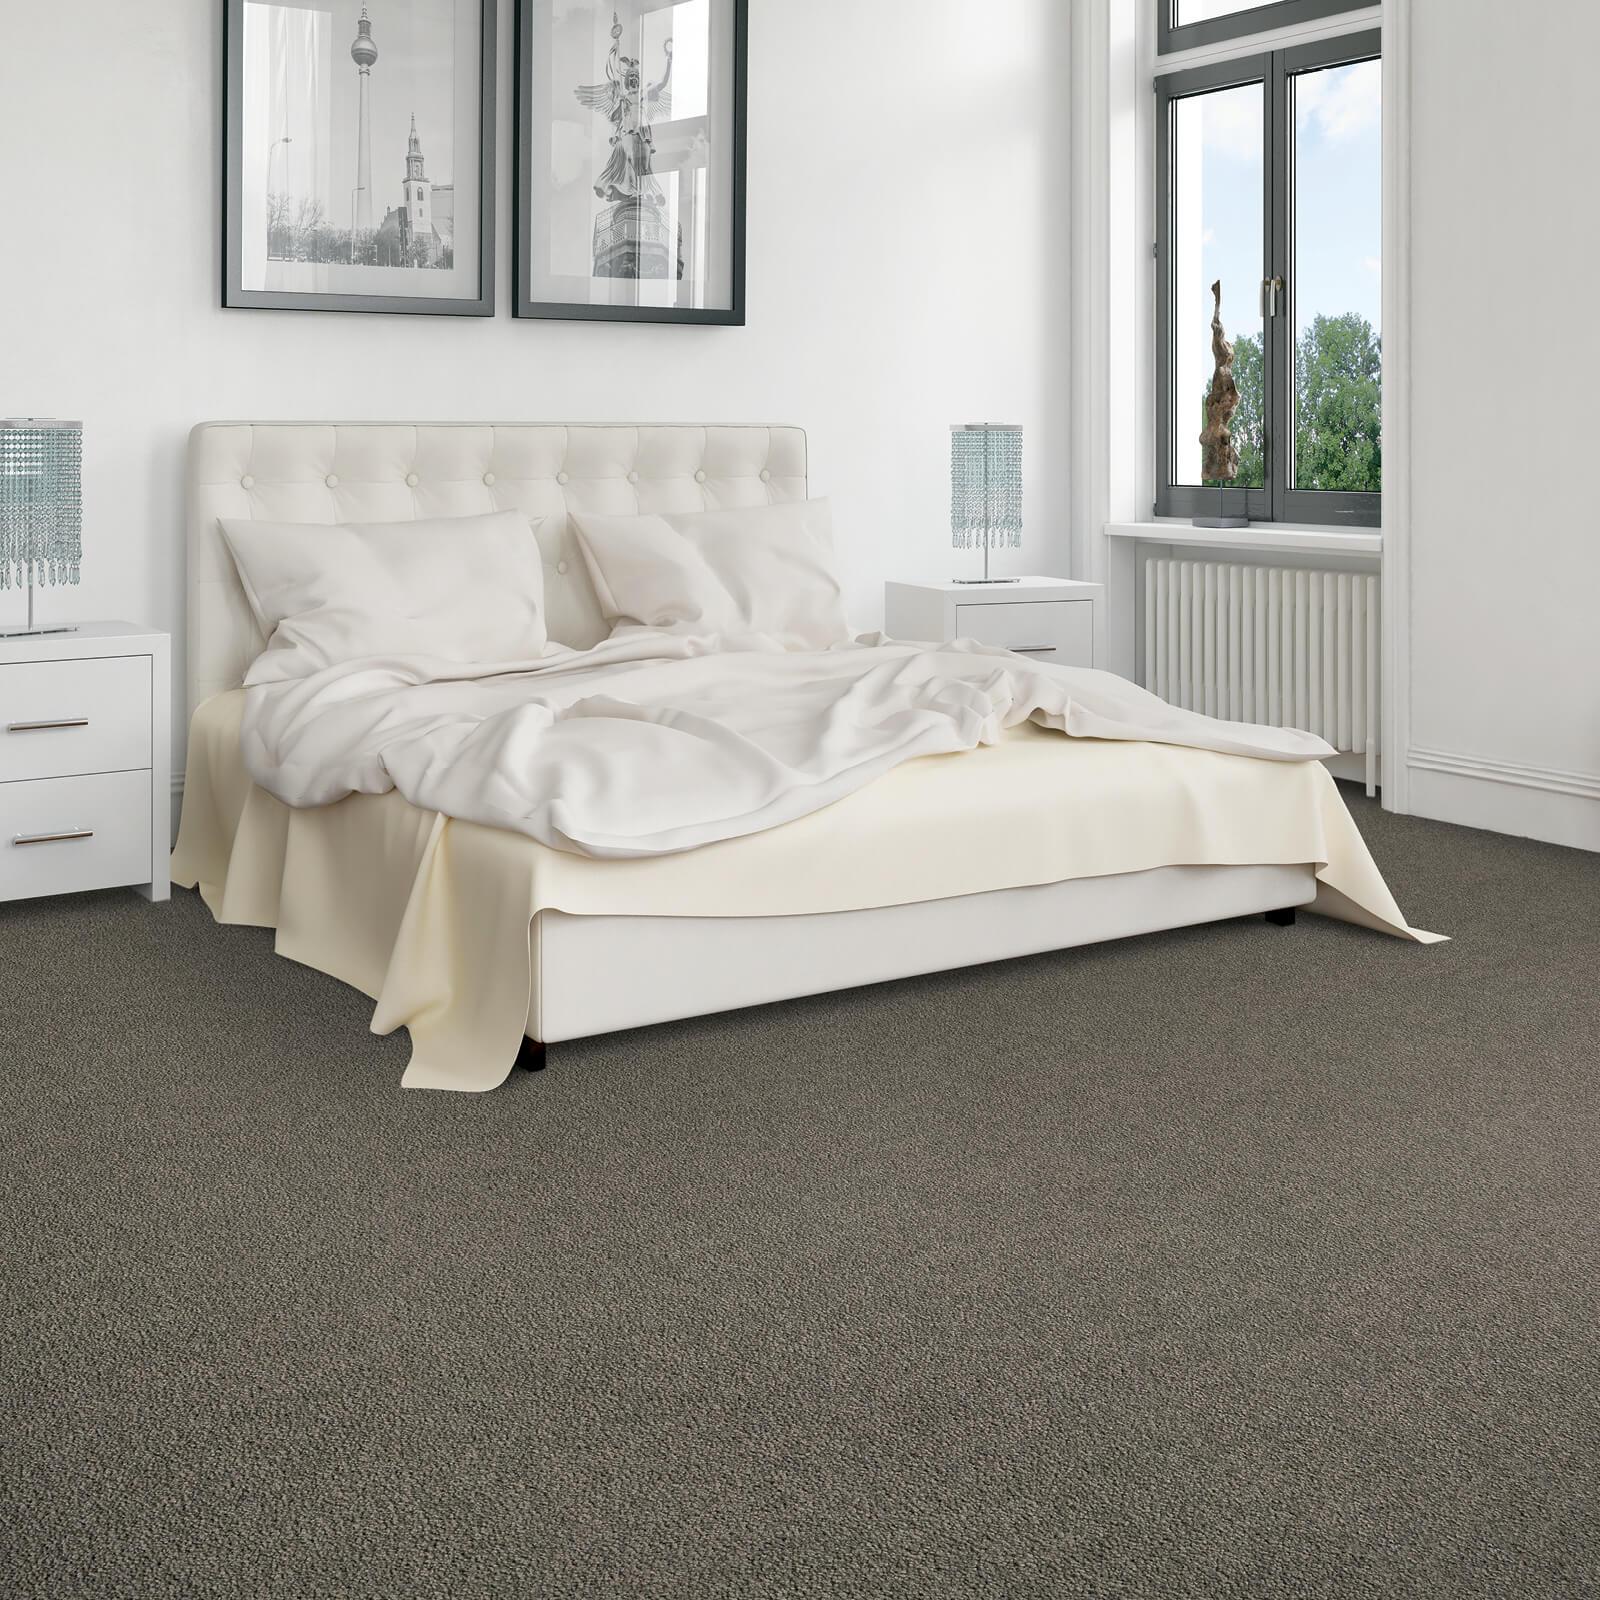 Bedroom Carpet | The Carpet Stop